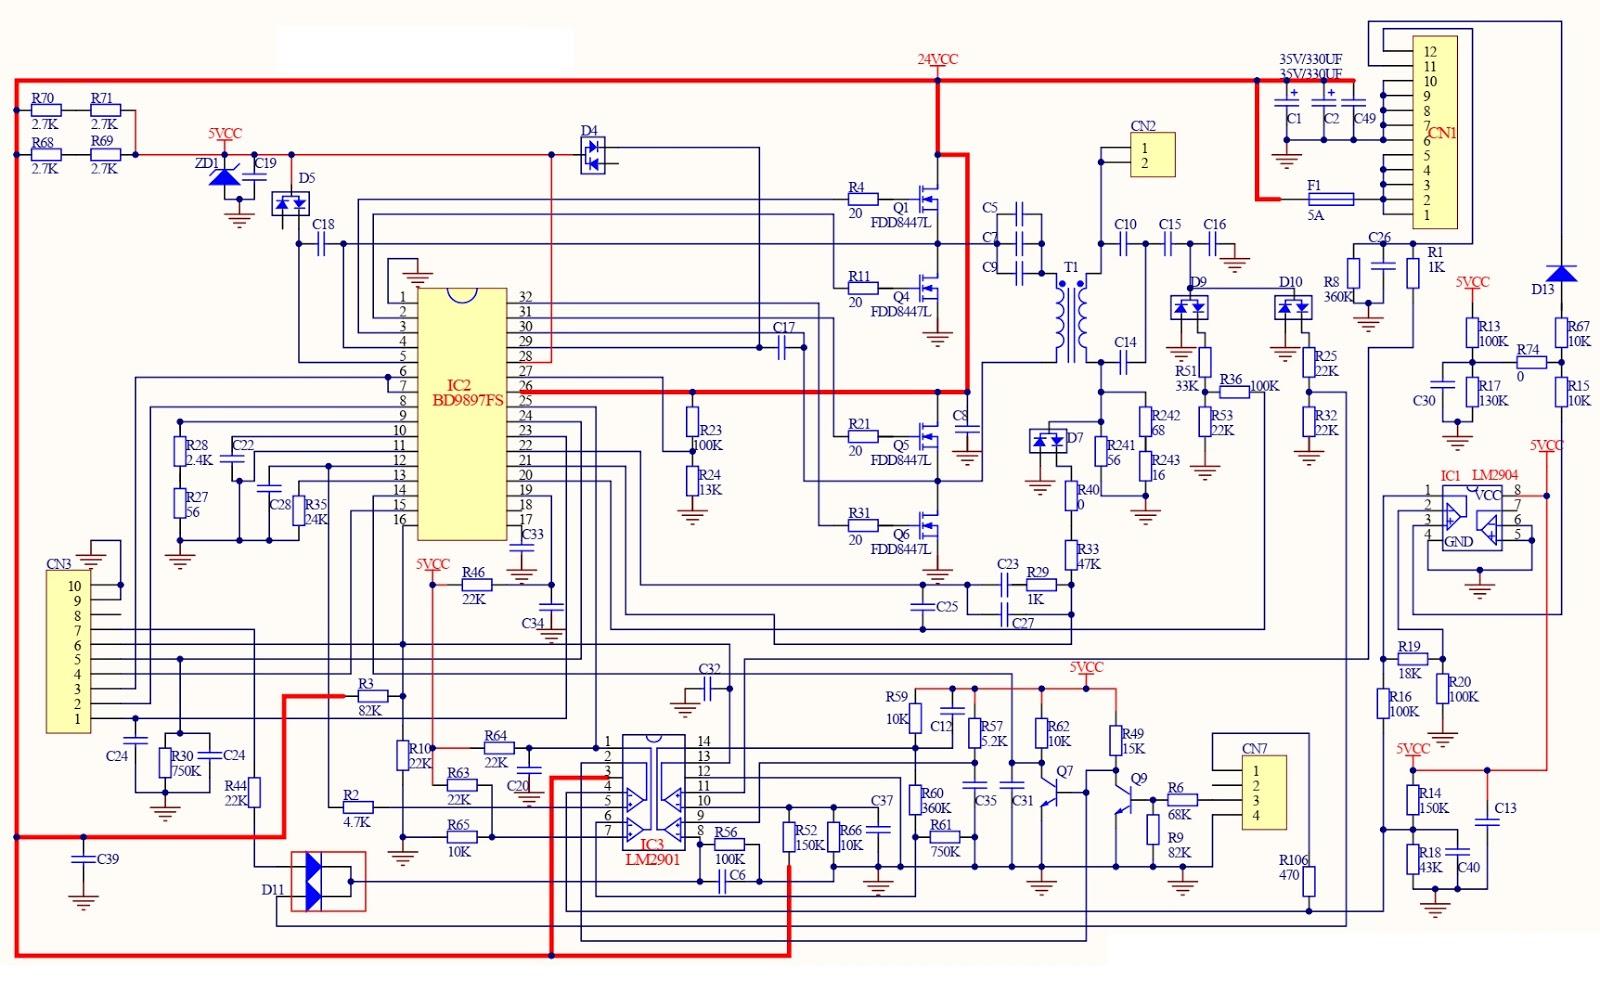 medium resolution of vizio lg and tcl lcd tv smps schematics schematic diagrams 42 vizio tv schematic diagram